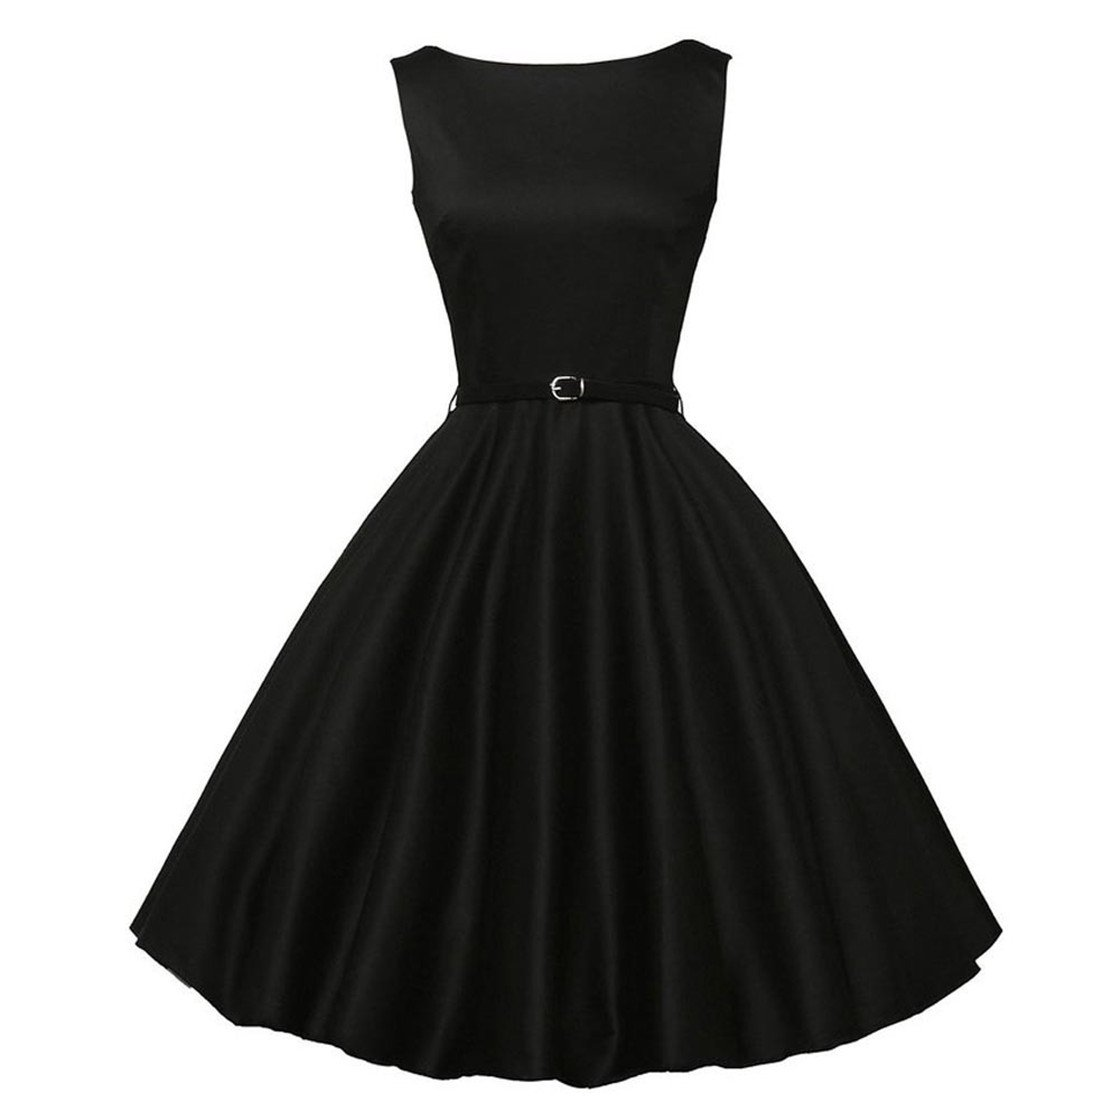 Mose New!!❃❤️❃! Dresses Women Vintage Bodycon Sleeveless Casual Retro Evening Party Tops Prom Swing Vintage Hepburn Style Waist Fashion Dress (XL, Black)